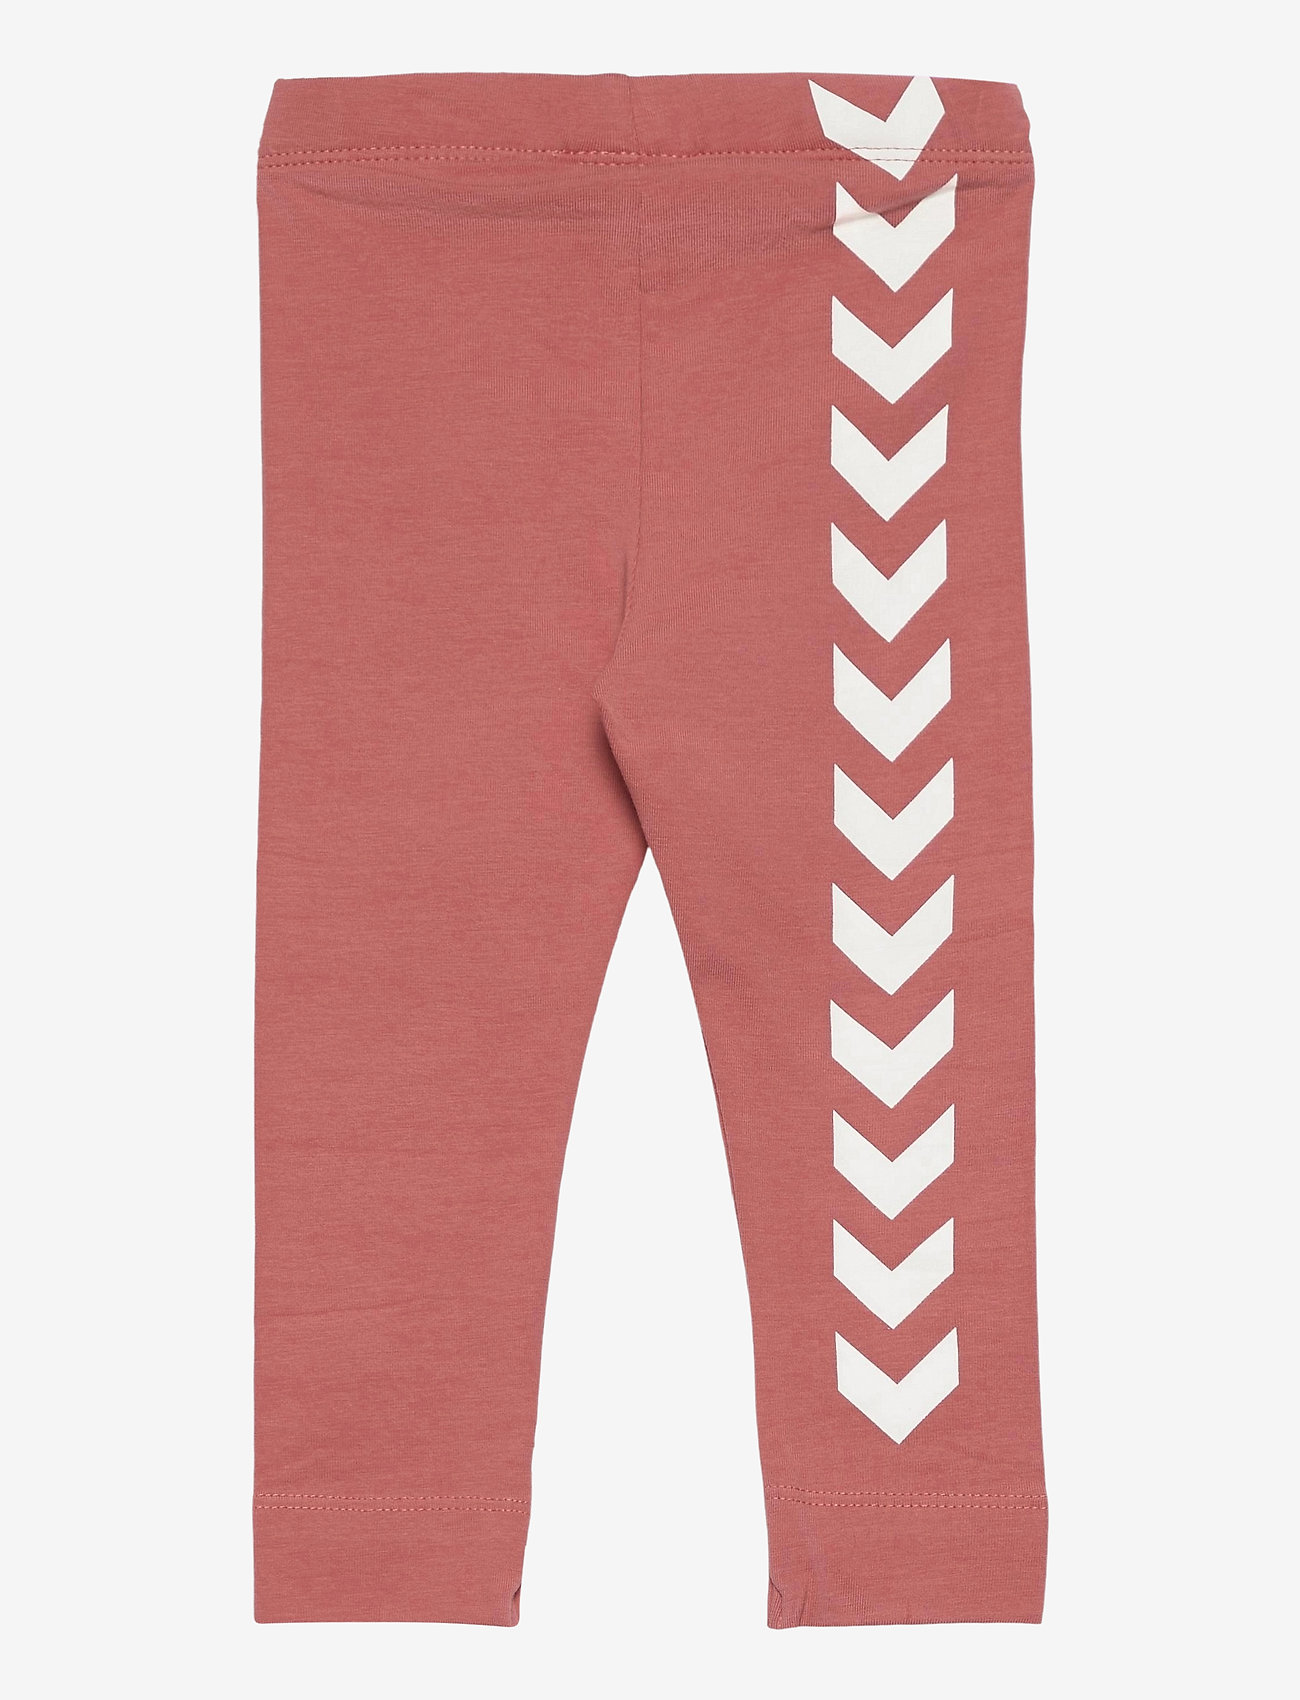 Hummel - hmlMAUI TIGHTS - leggings - faded rose - 1